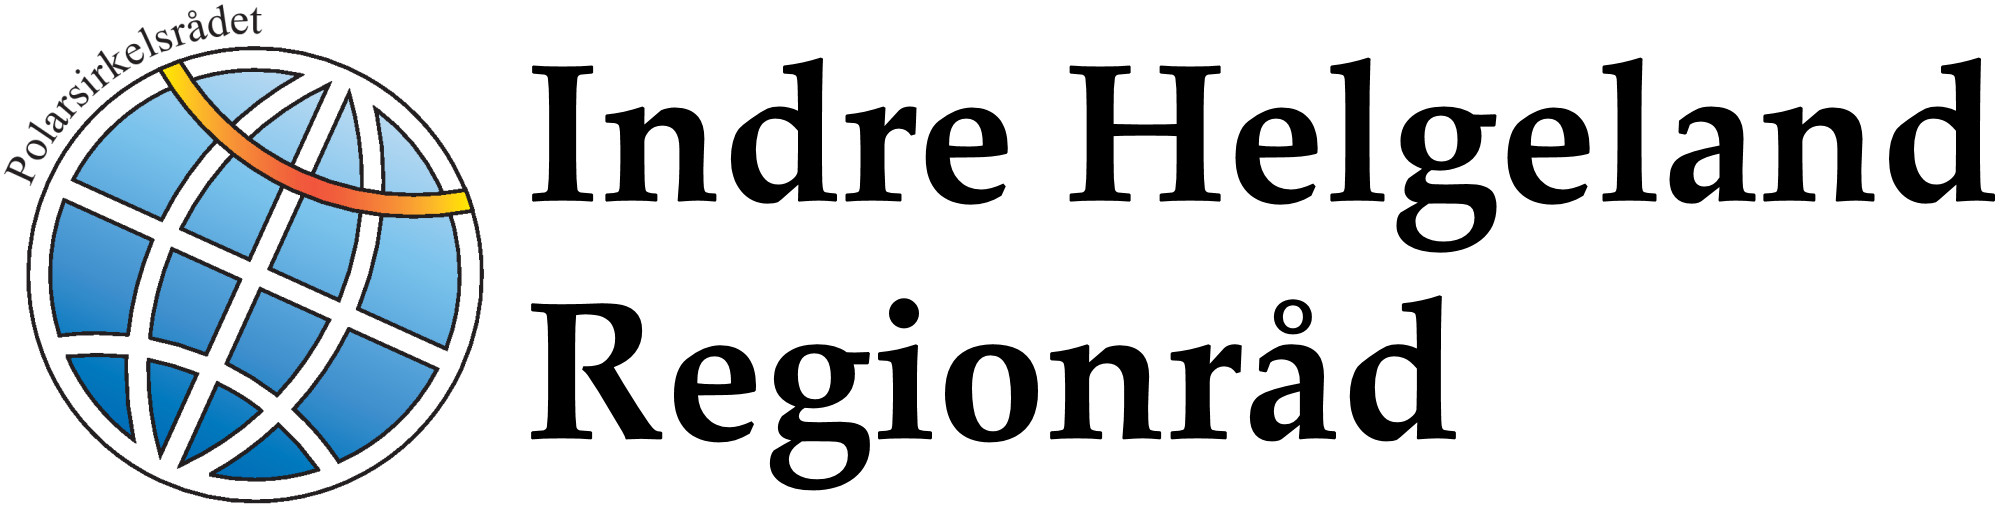 Indre Helgeland Regionråd – Hattfjelldal Hemnes Lurøy Nesna Rana